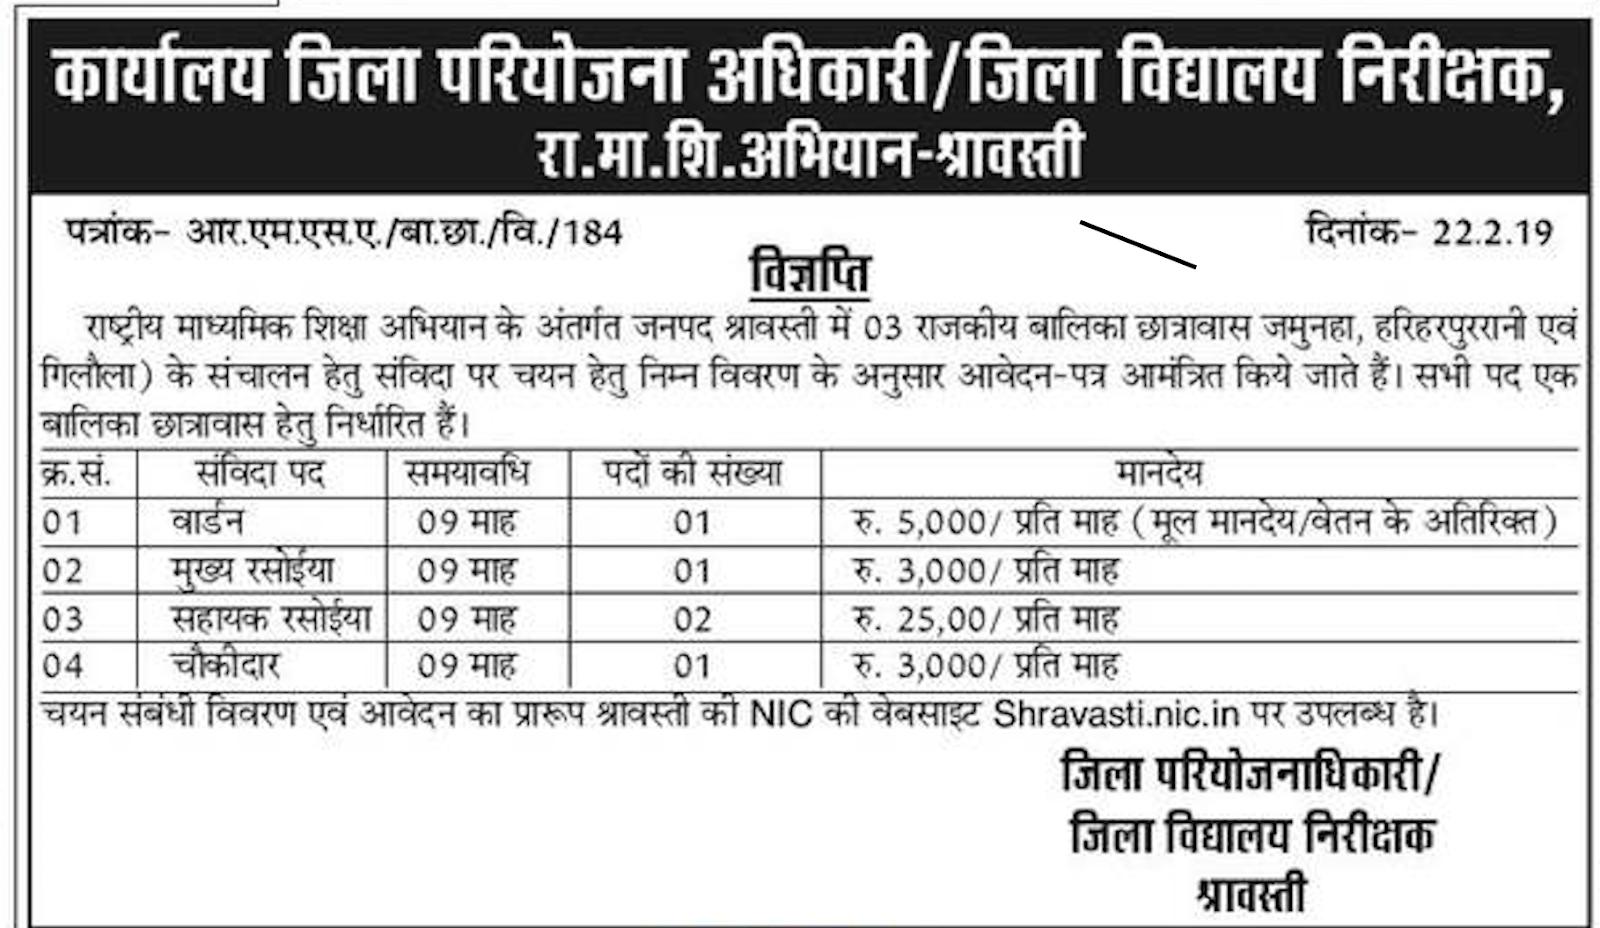 UP Jila Vidyalaya Nirikshak Vibhag Vacancy 2019 Girls Histel, Group x